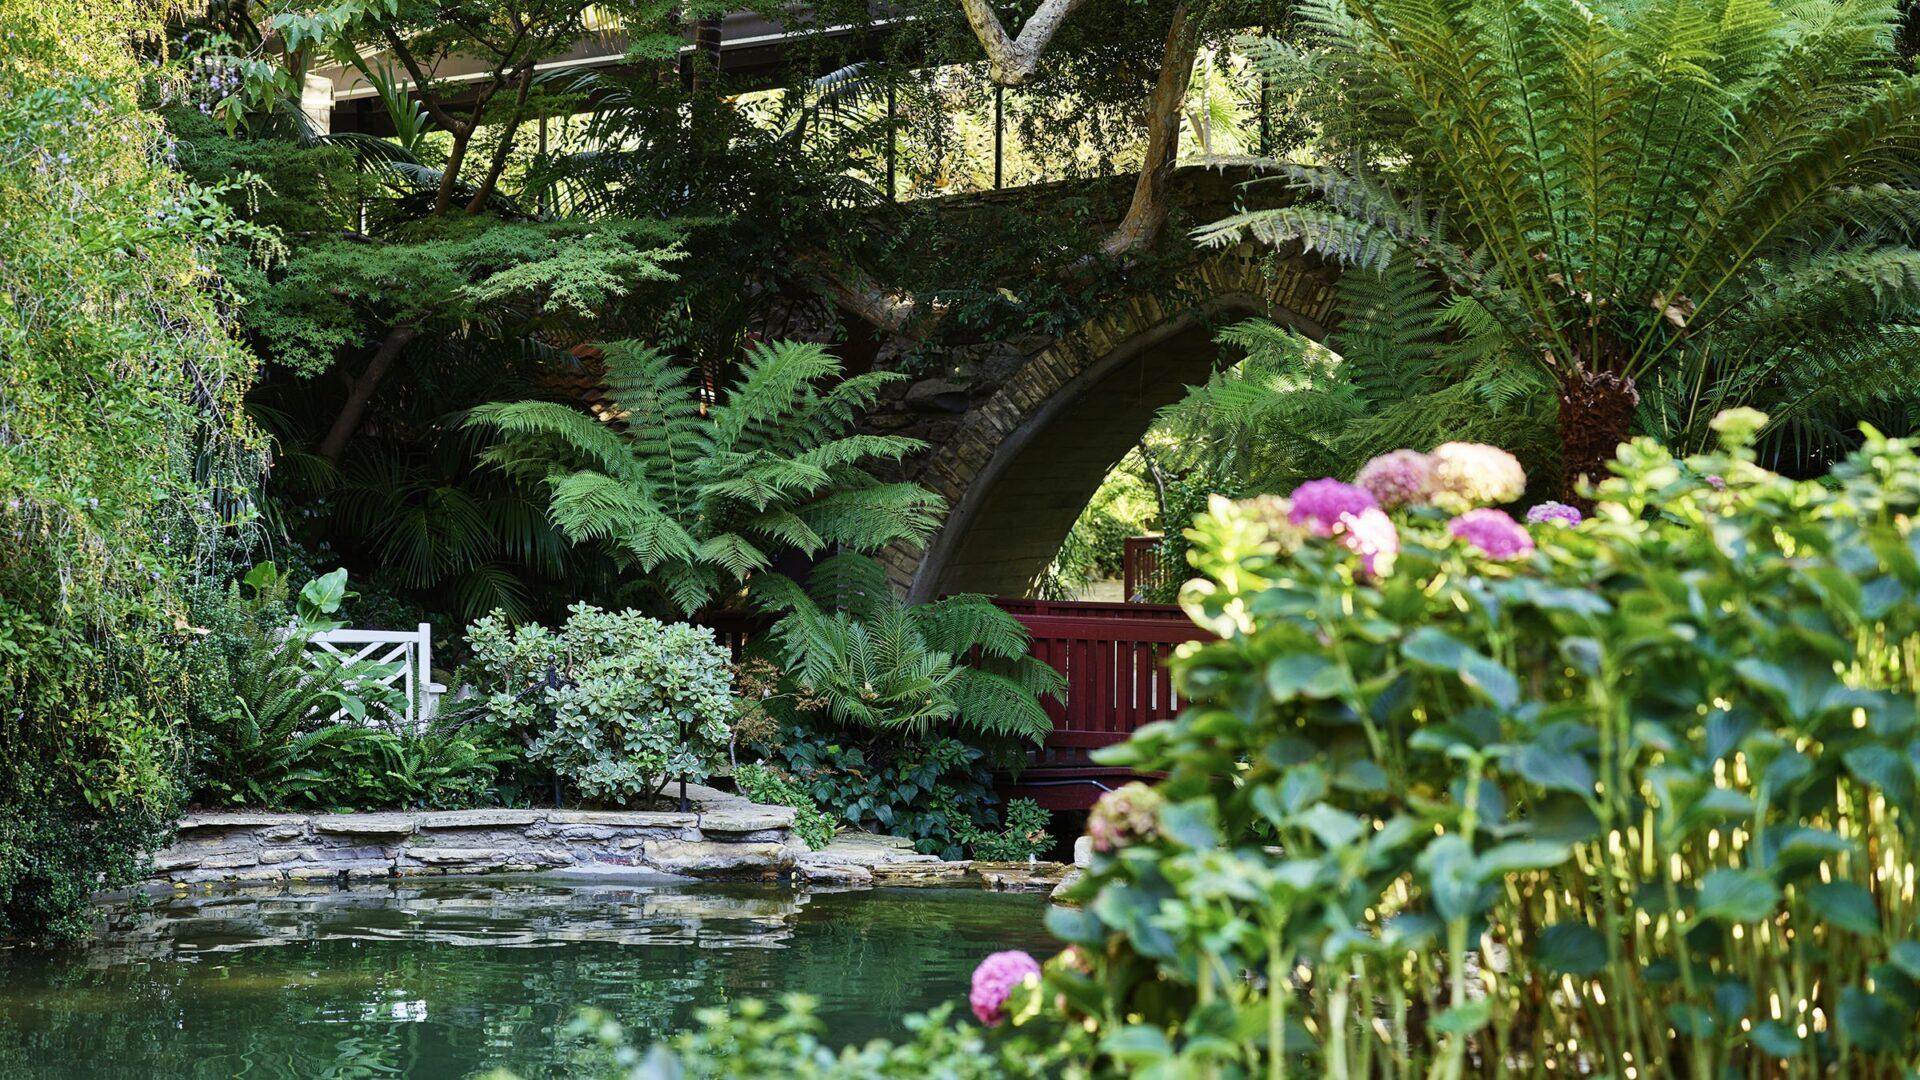 The Swan Lake Grotto Bridge at the Hotel Bel-Air